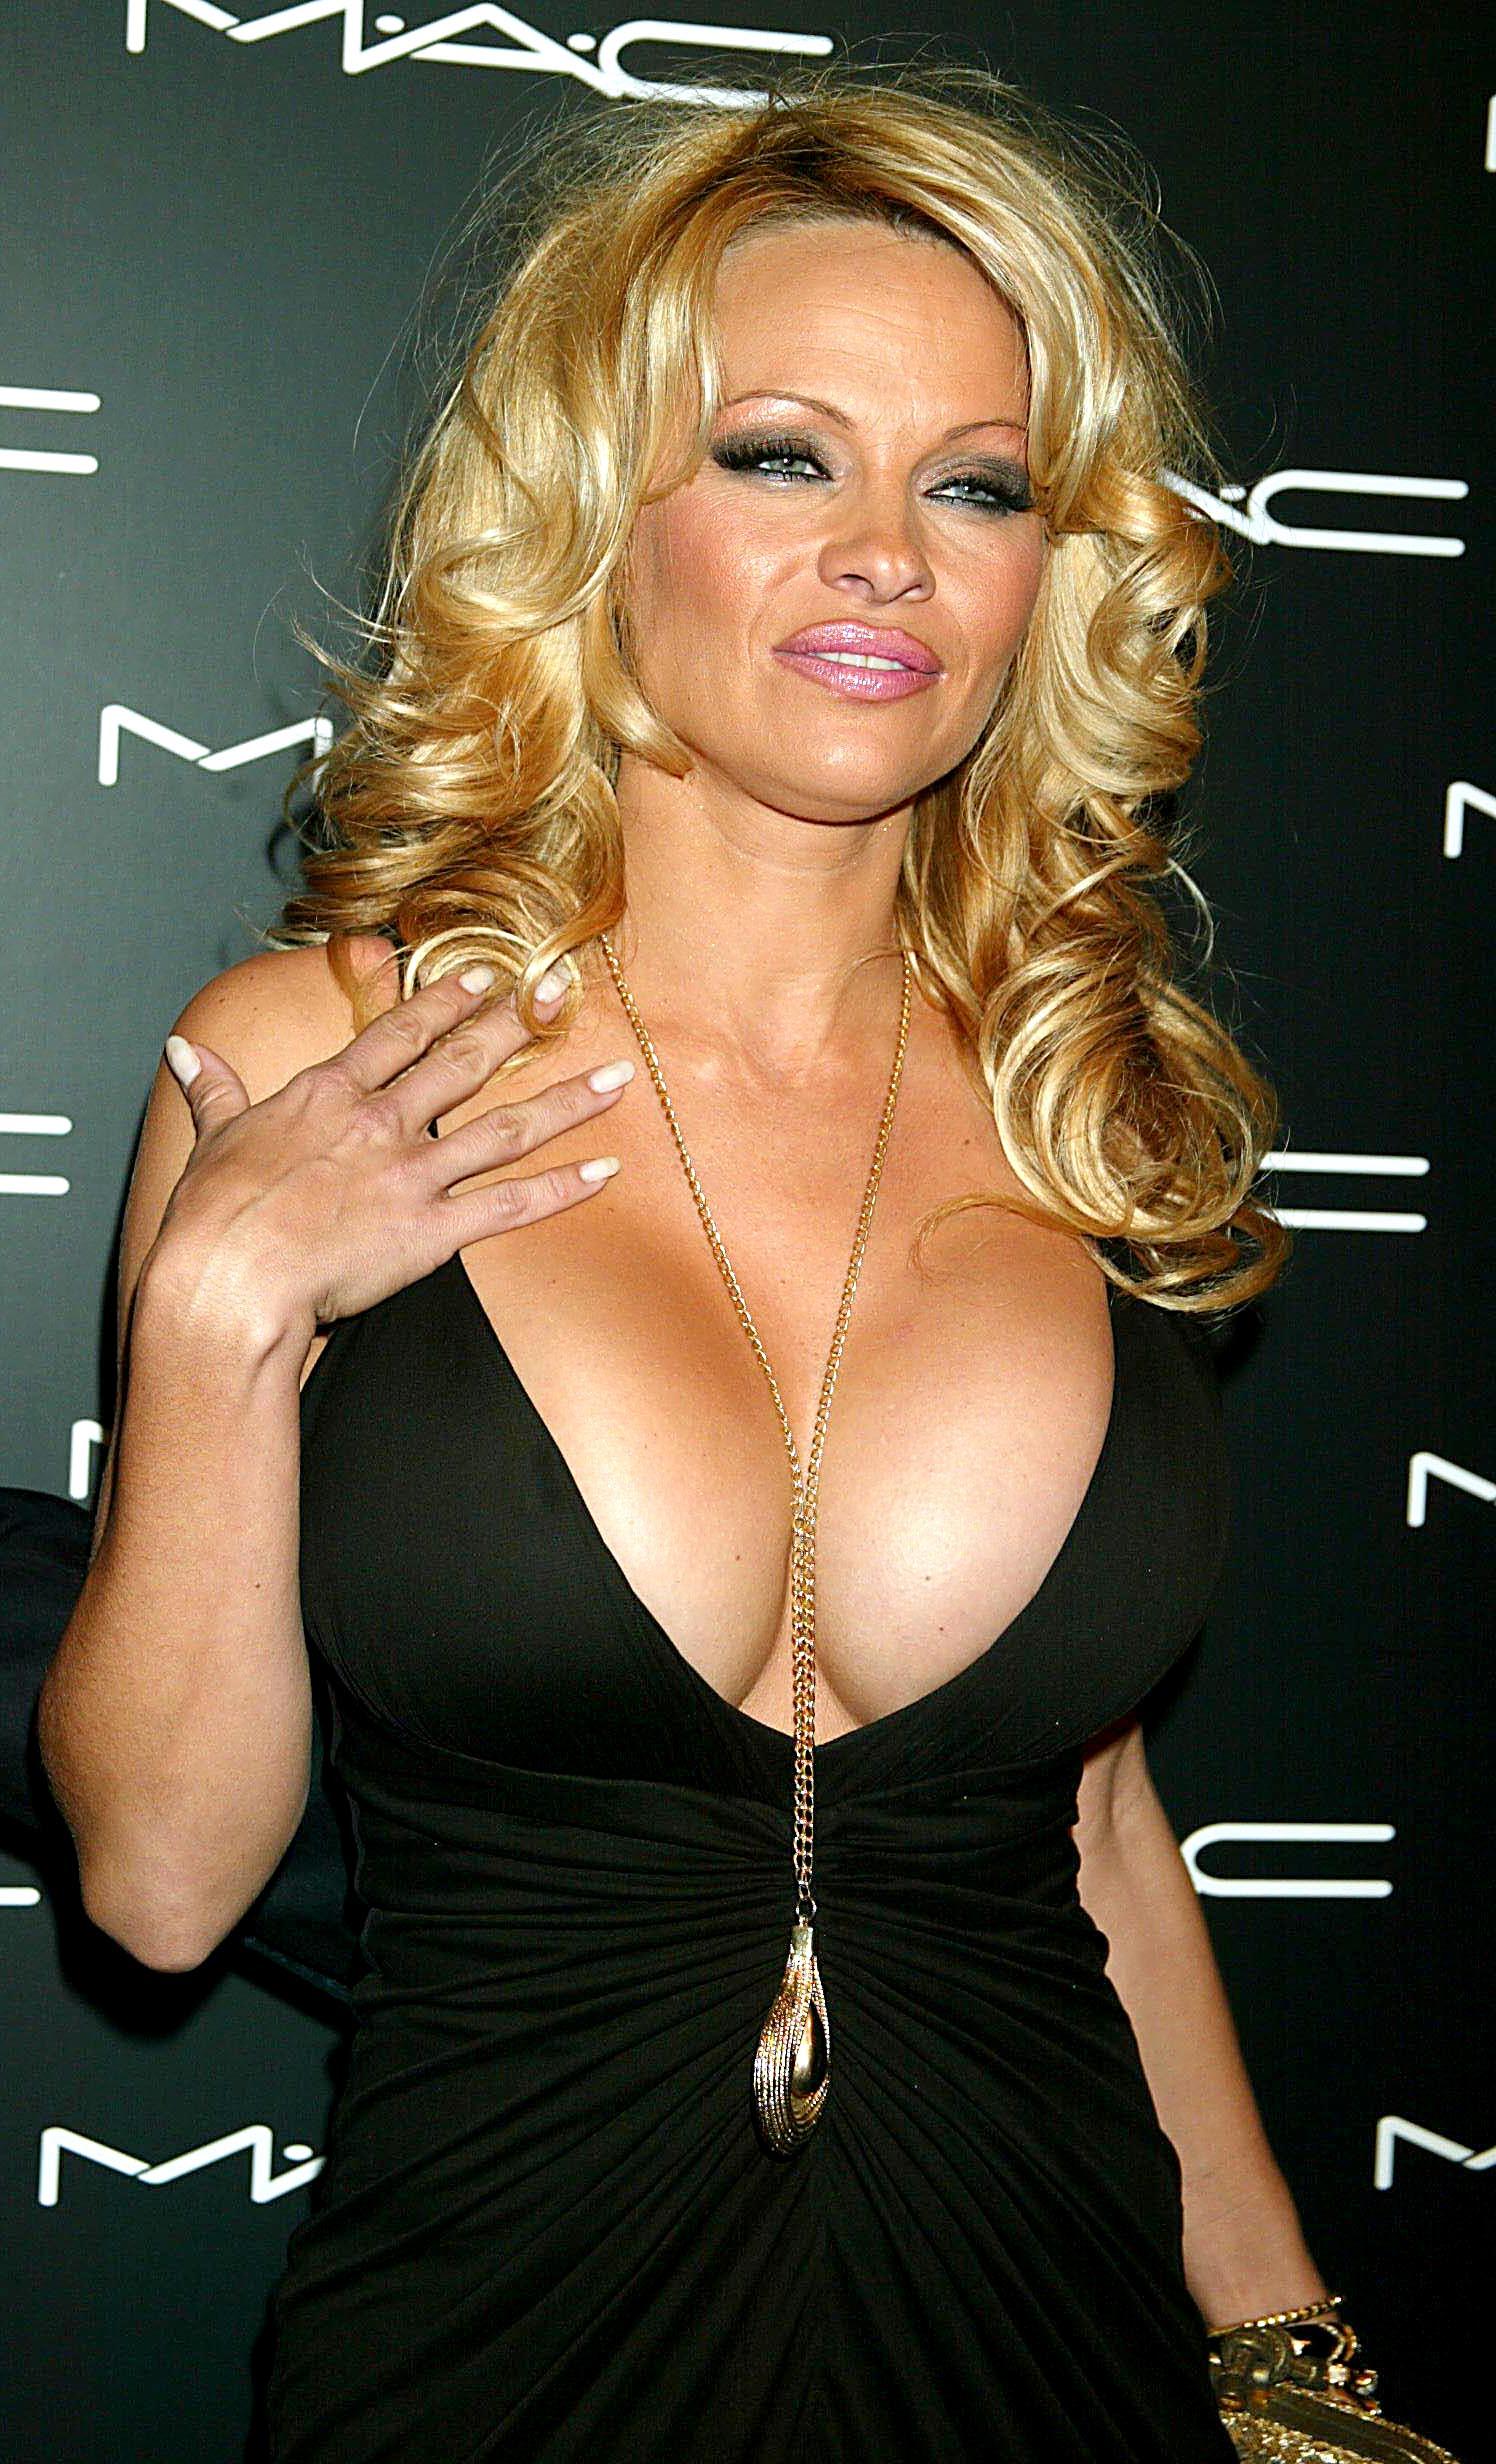 Pamela anderson fashion week boob porn hidden cams